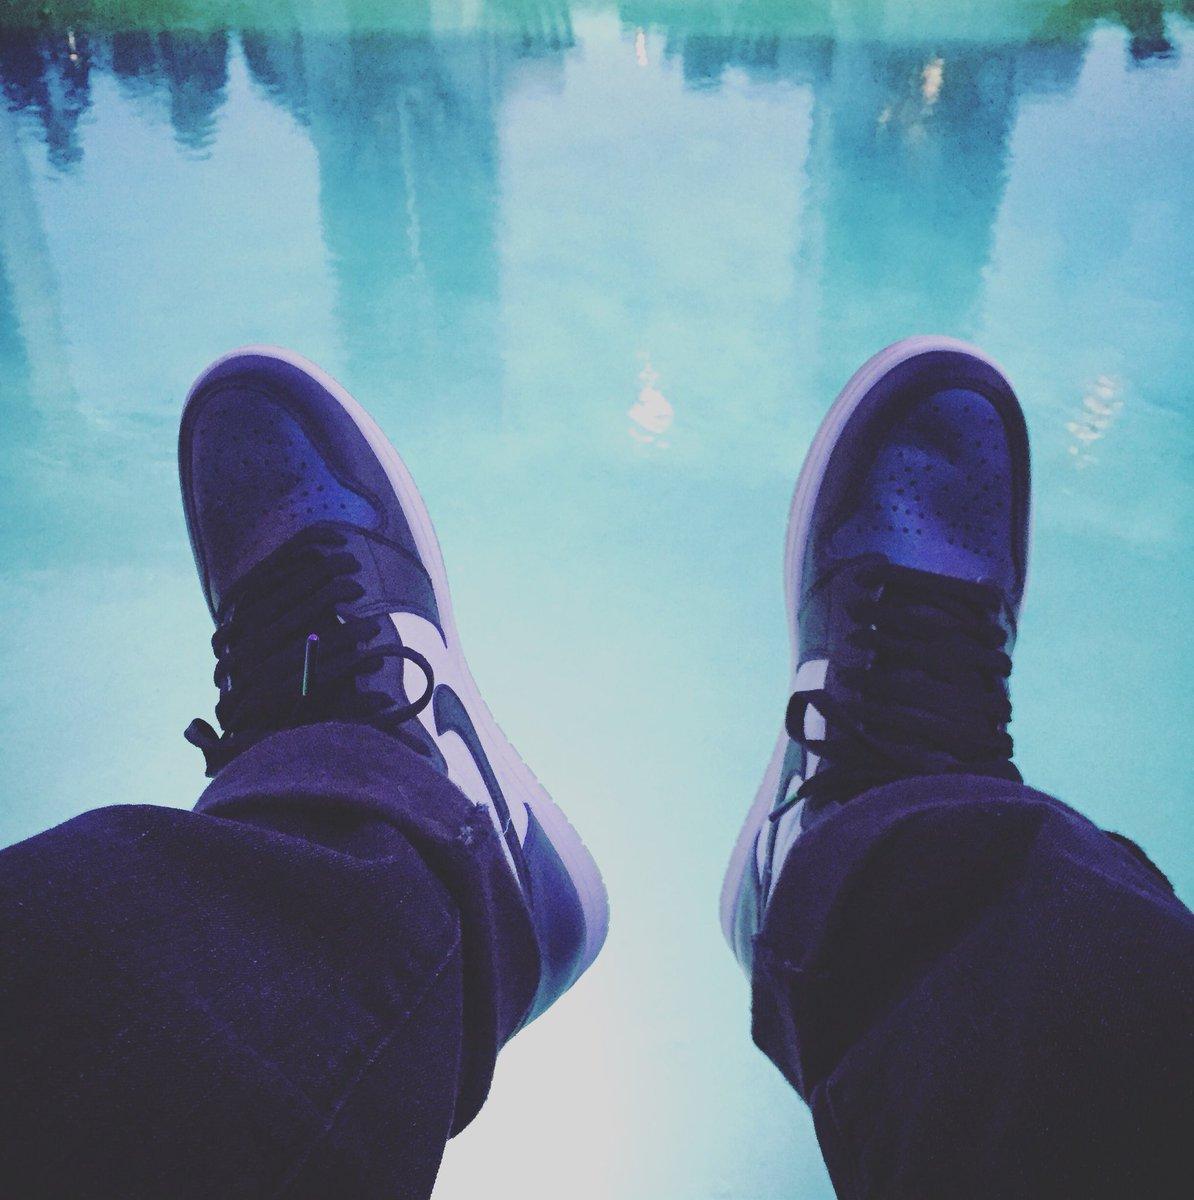 Floatin. #FreshKickFriday I'm the highly underrated #AJ1 Chameleon All-Stars. #Sneakerhead #Perspective